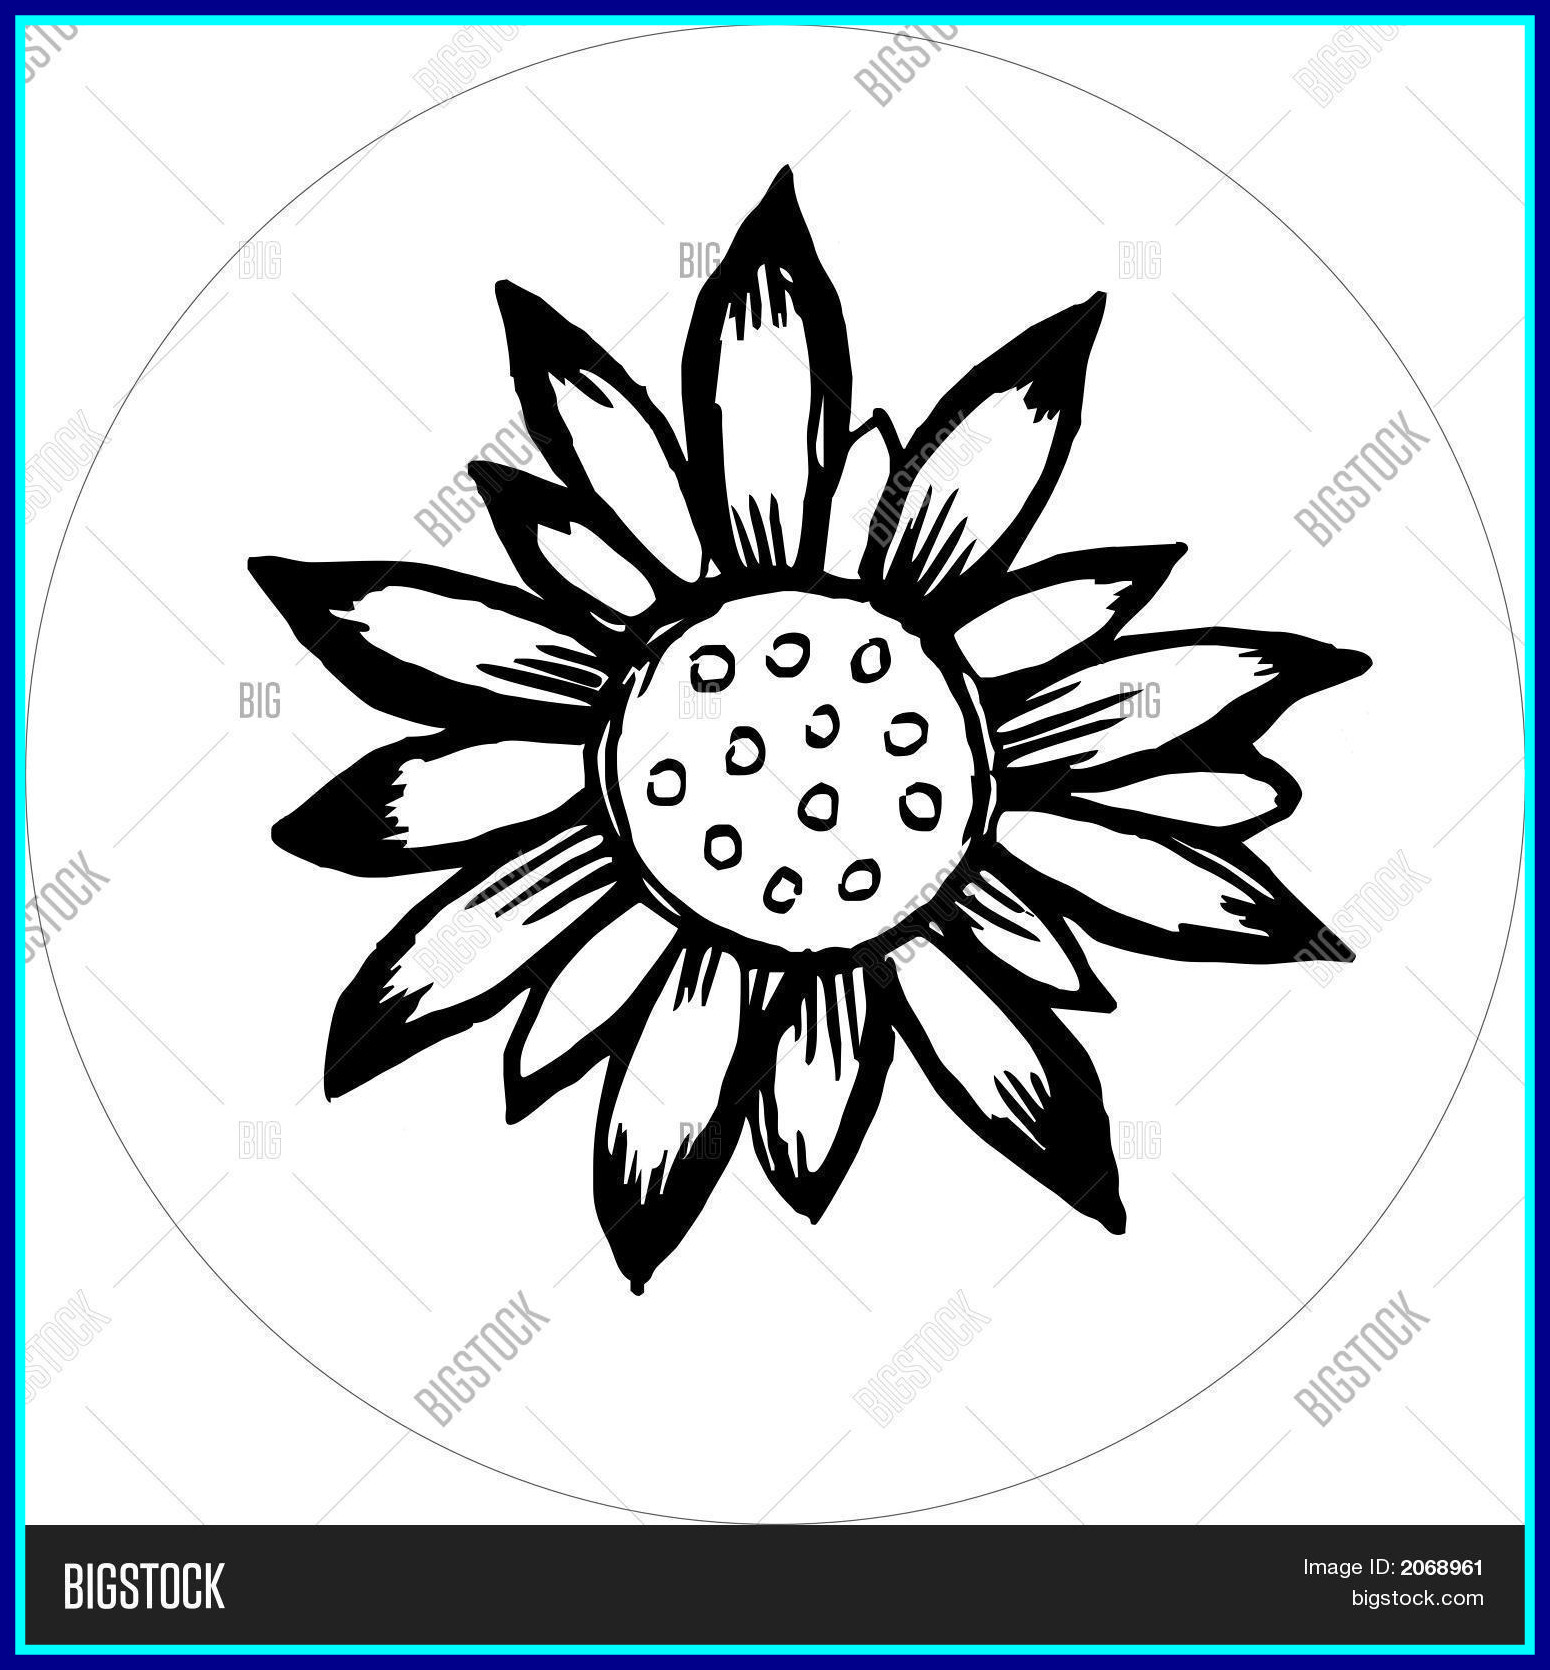 1550x1670 Amazing Flower Draw Black White Eps Vector U Photo Bigstock For